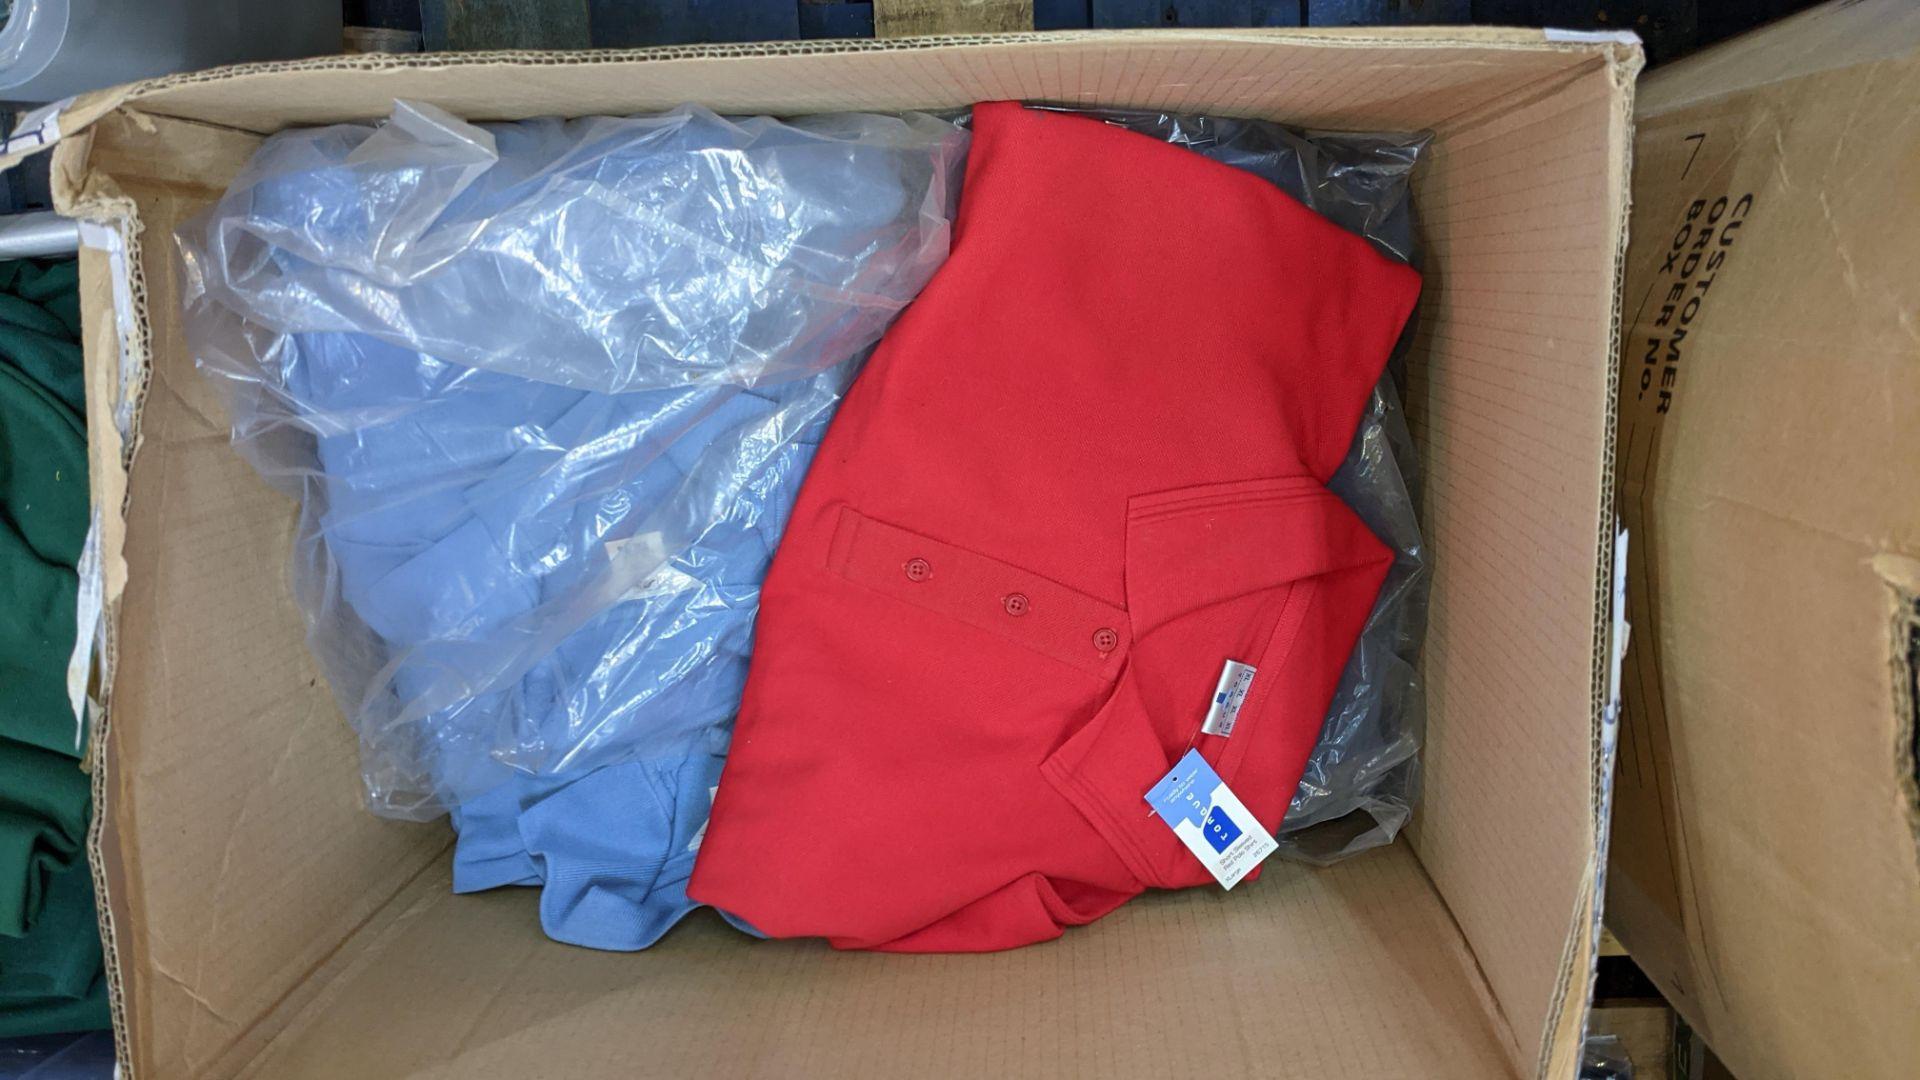 20 assorted polo shirts - 1 large box - Image 3 of 5